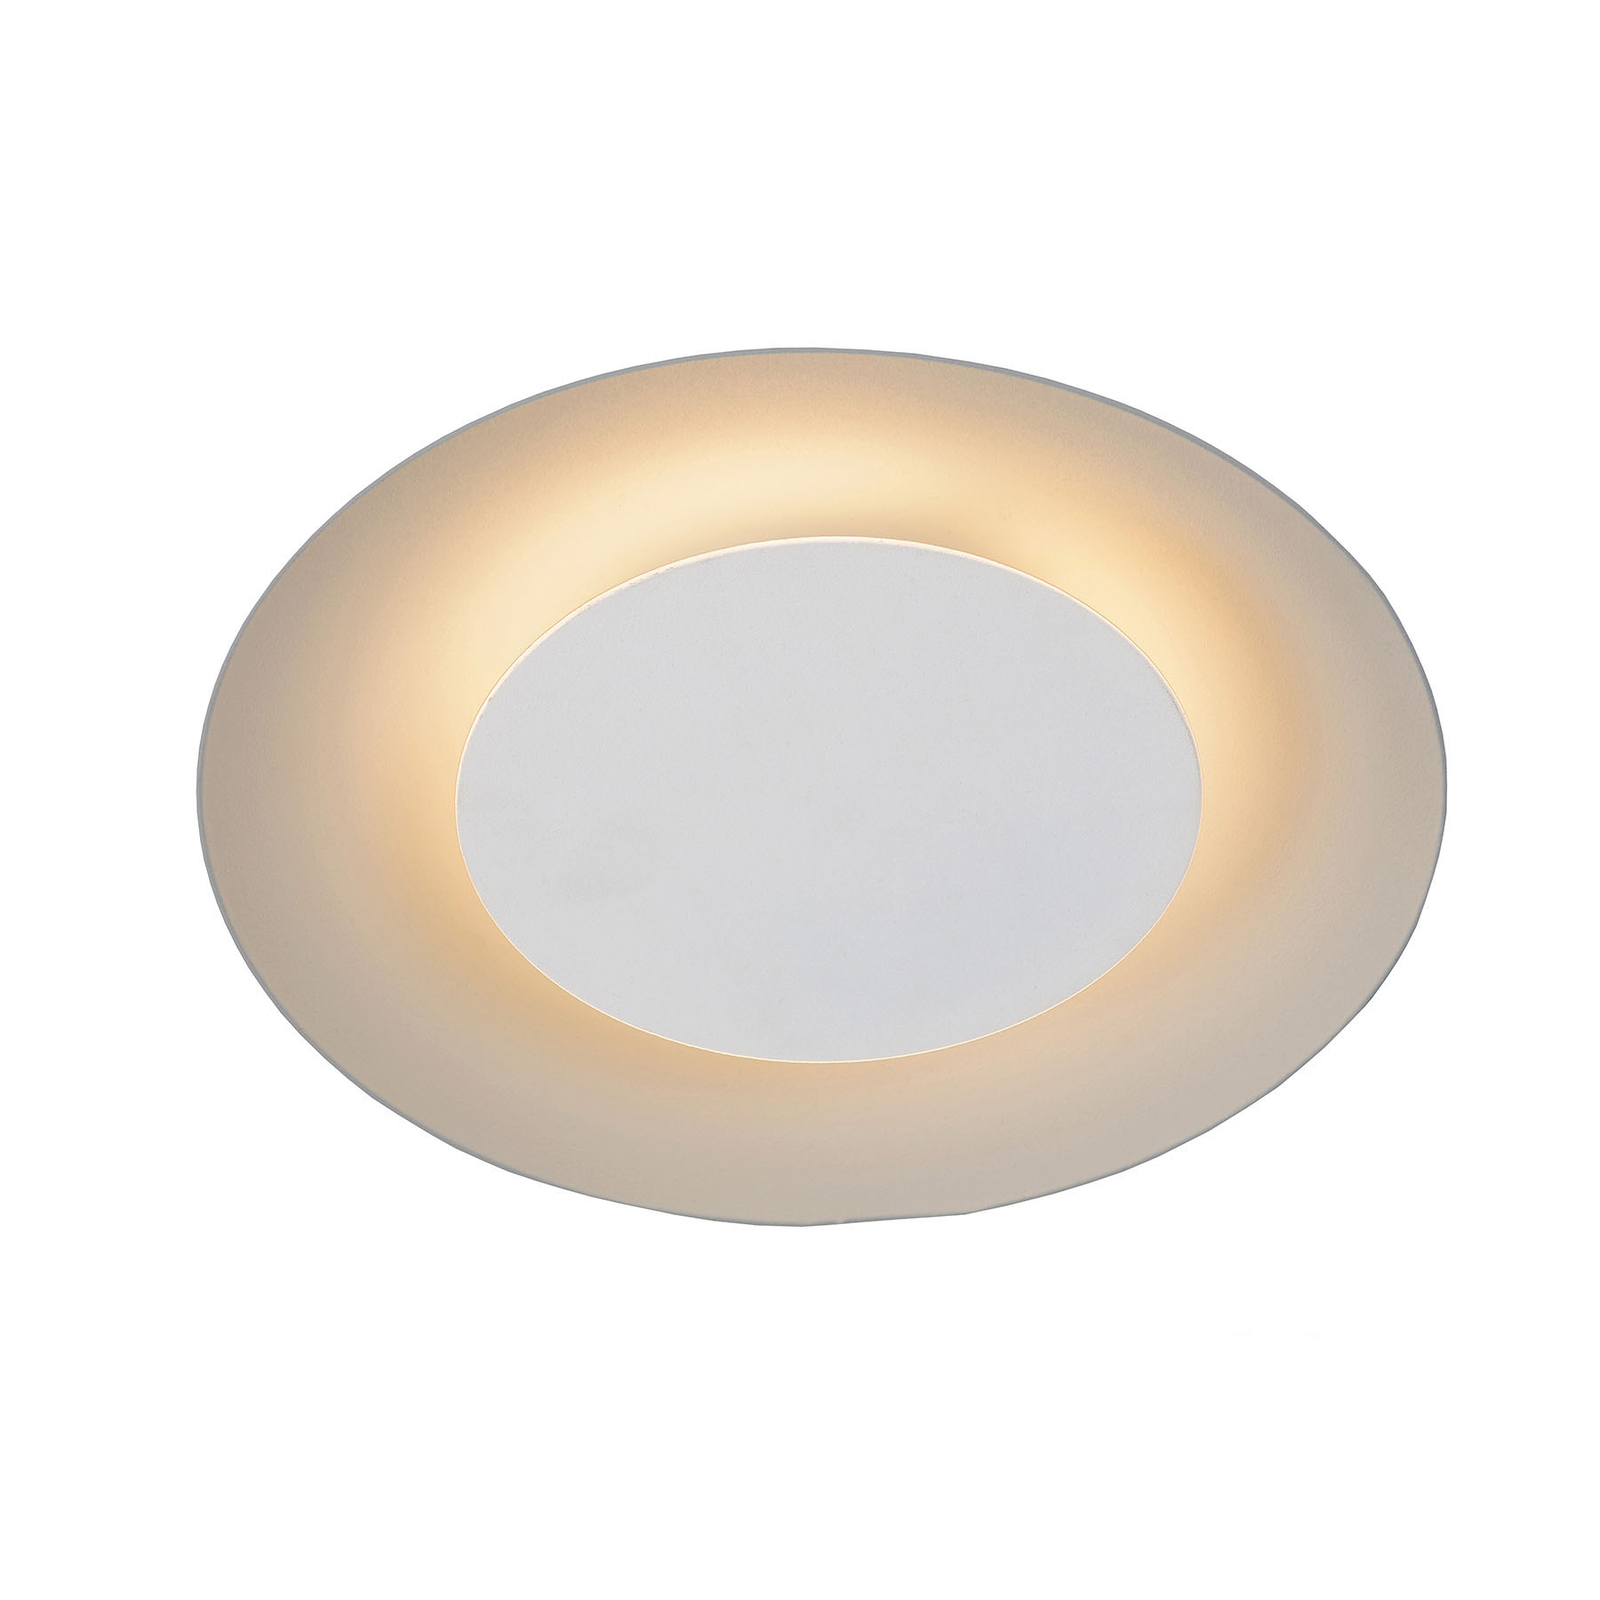 LED-kattovalaisin Foskal, valkoinen, Ø 21,5 cm